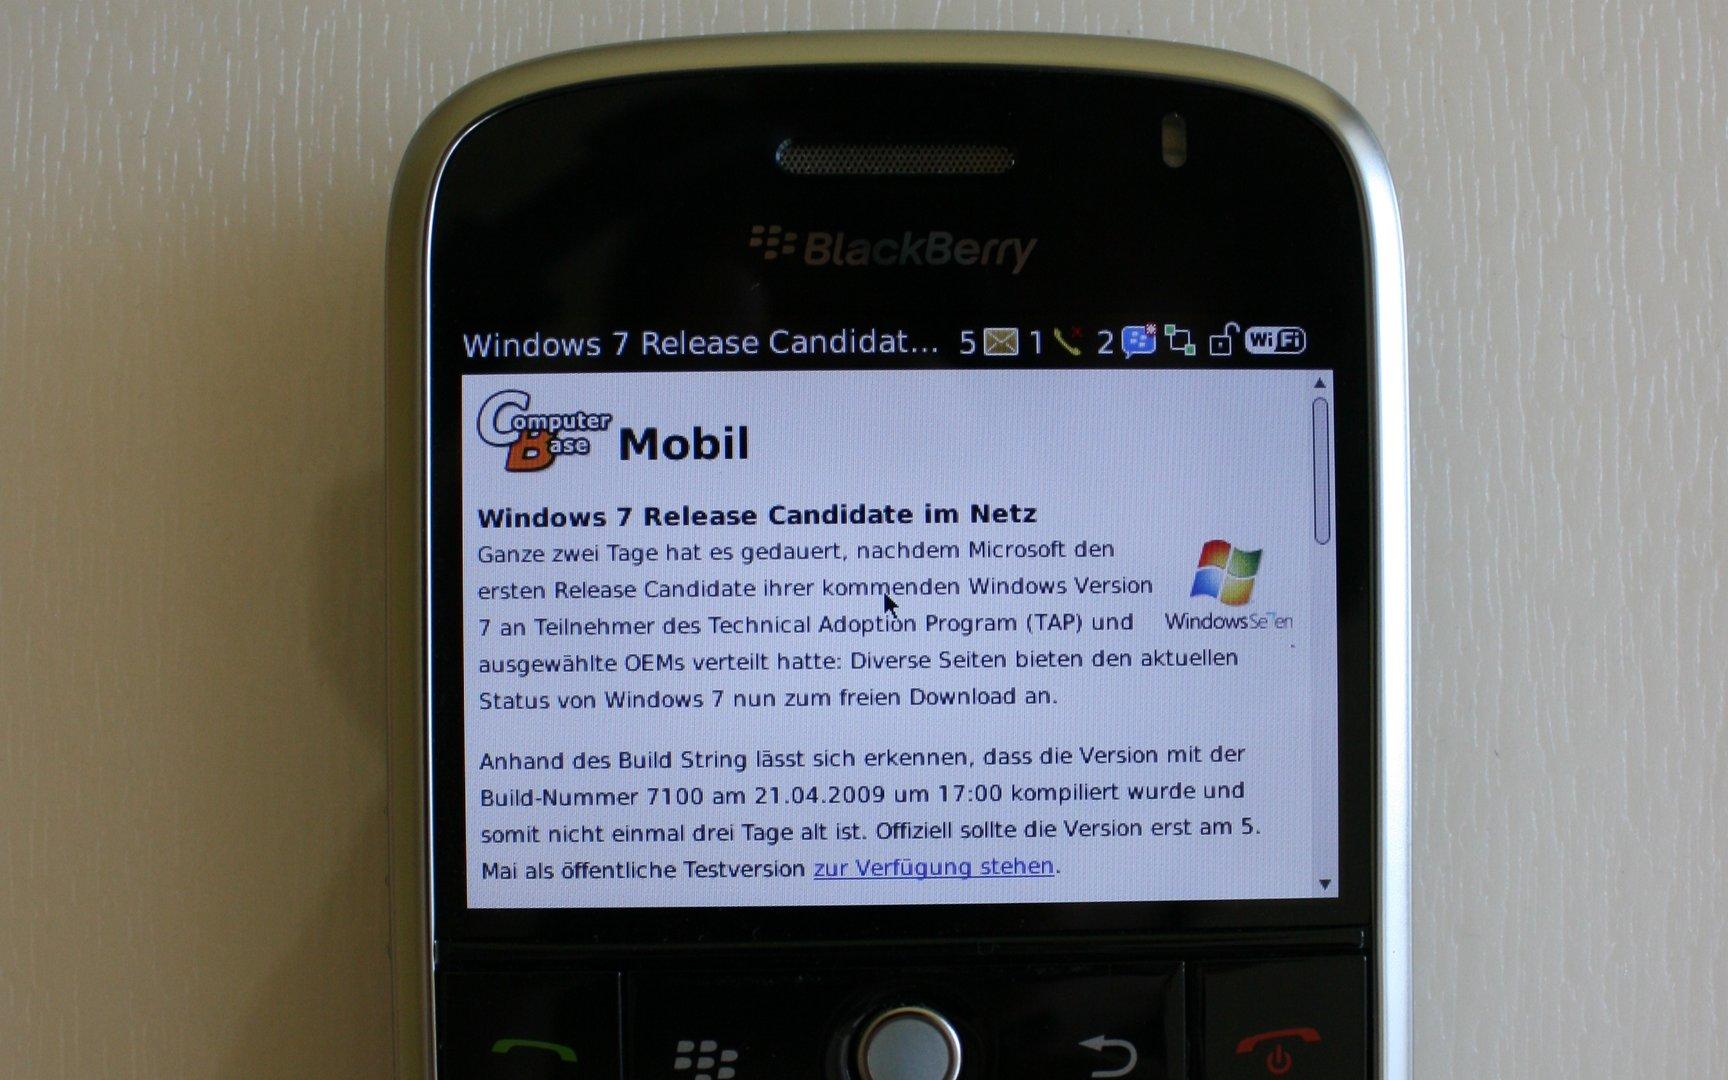 ComputerBase Mobil @ BlackBerry